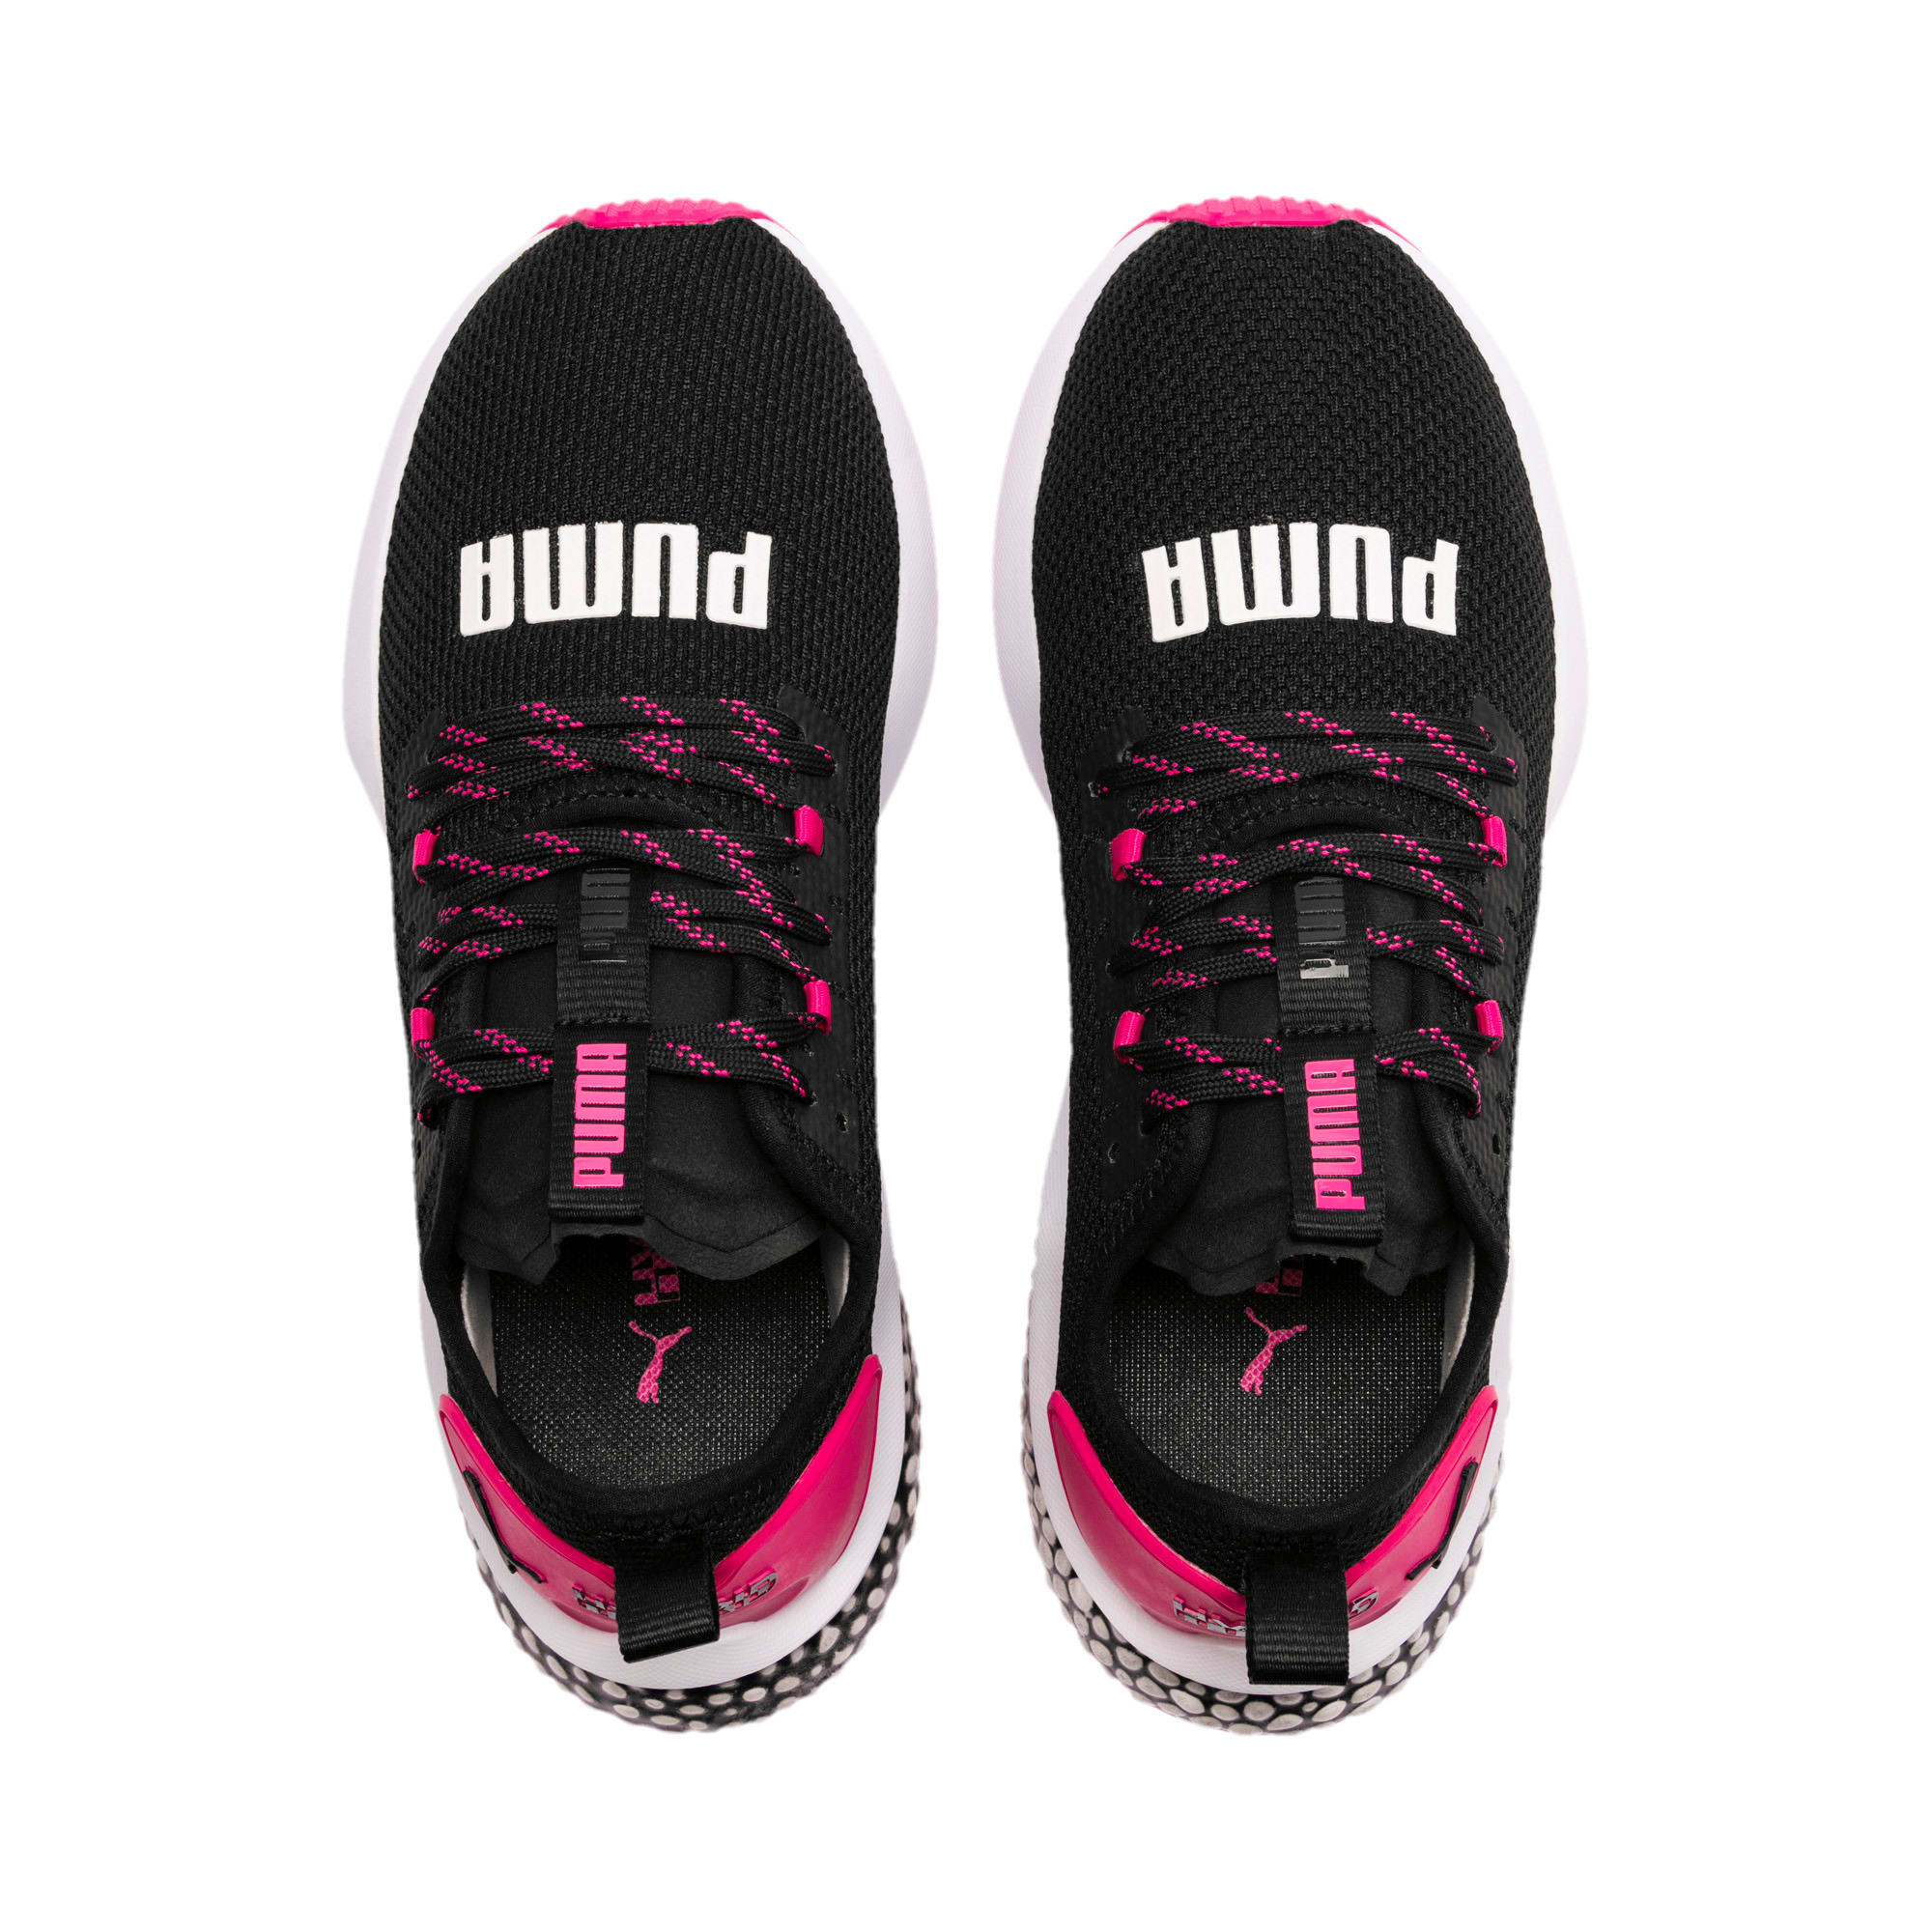 Thumbnail 7 of HYBRID NX Women's Running Shoes, Puma Black-Fuchsia Purple, medium